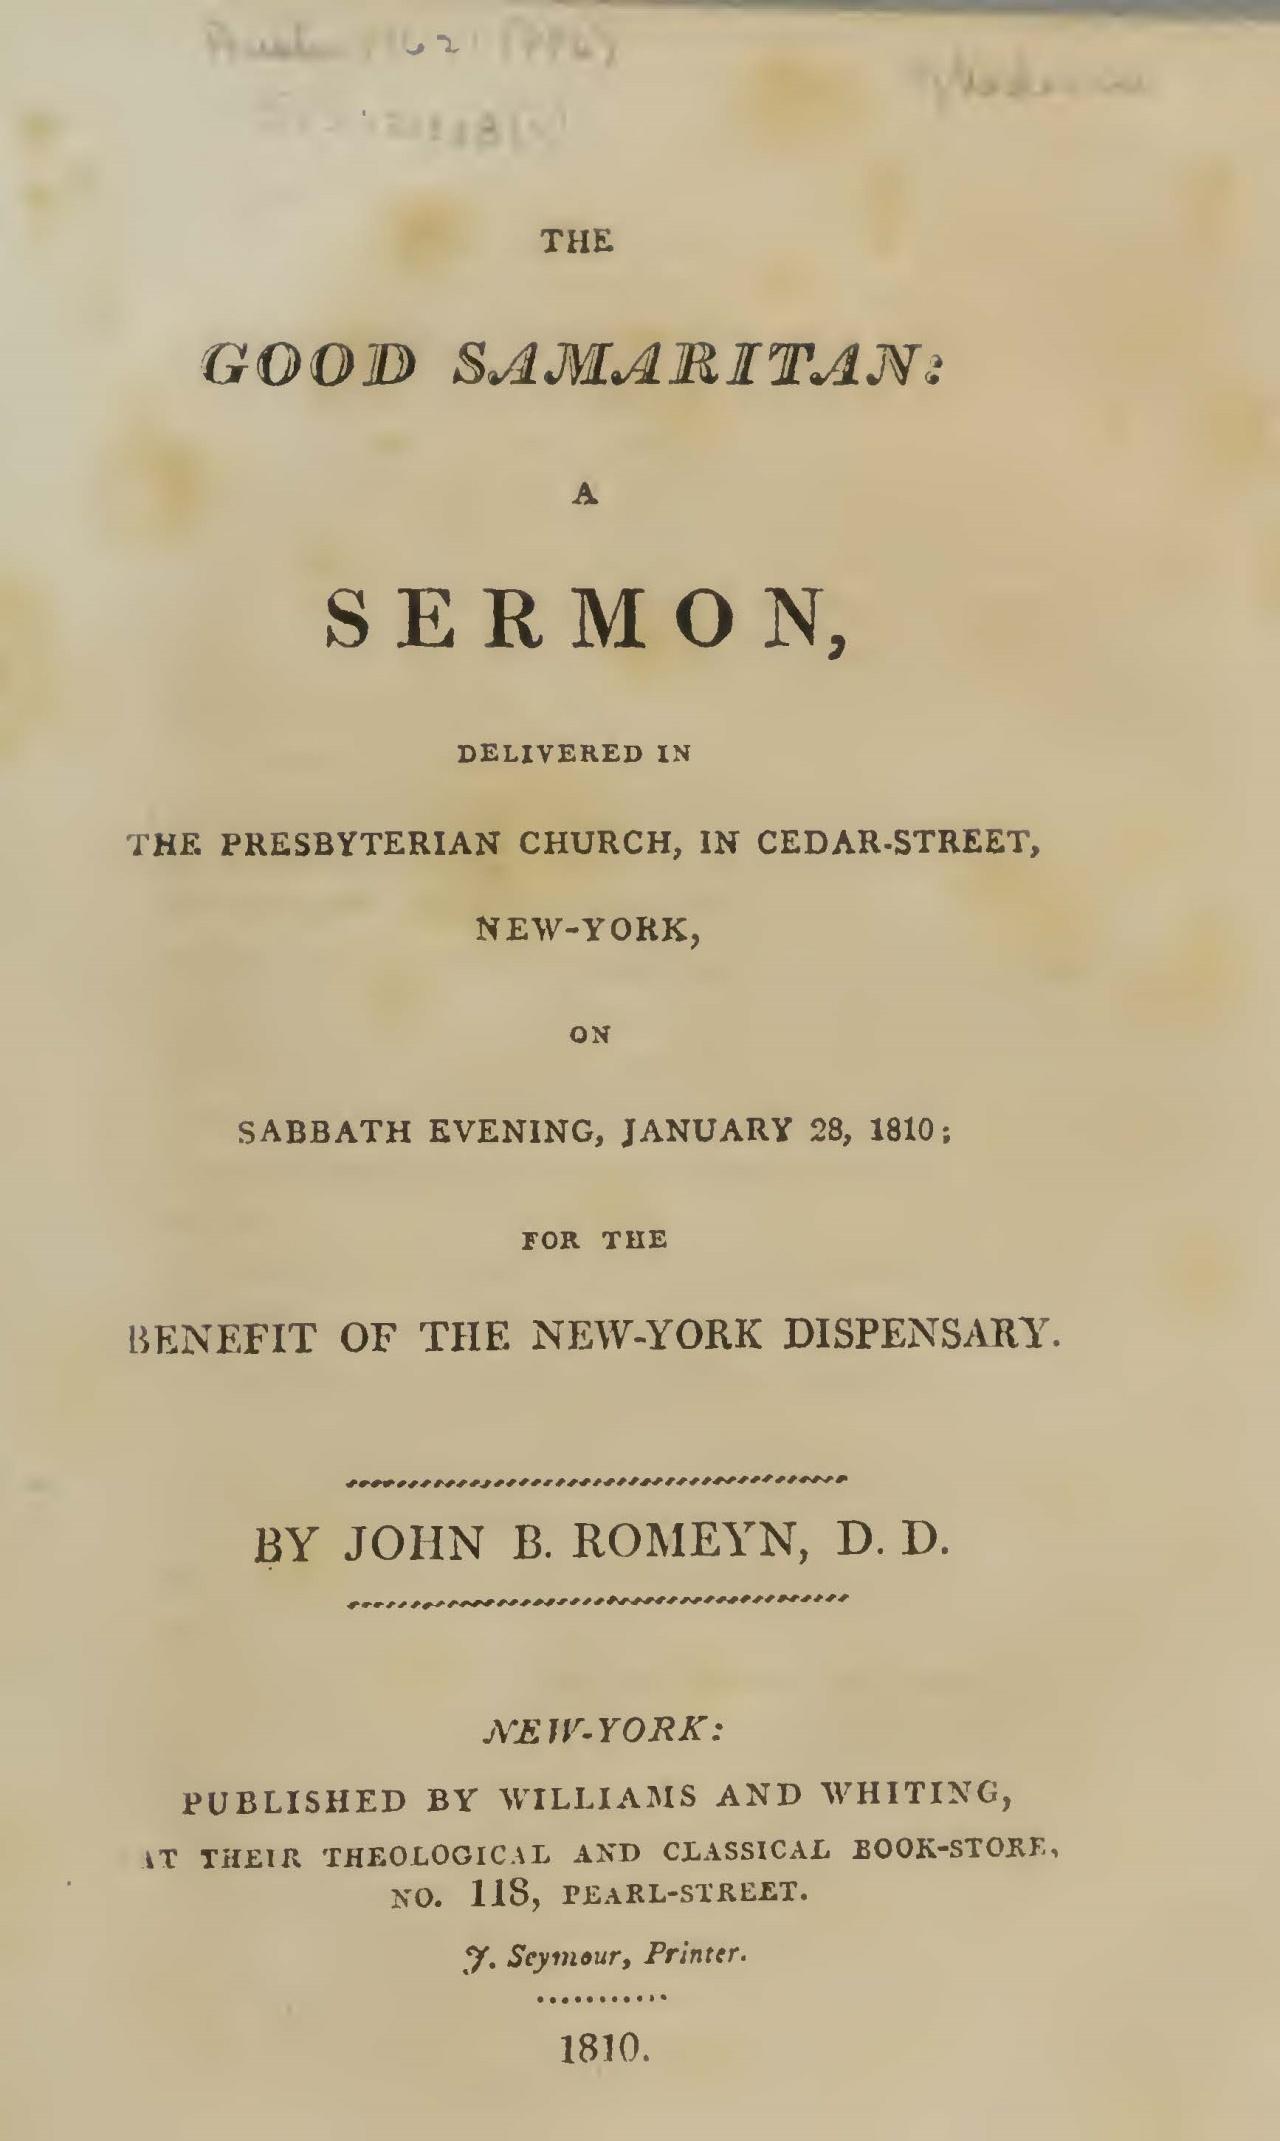 Romeyn, John Brodhead, The Good Samaritan A Sermon Title Page.jpg